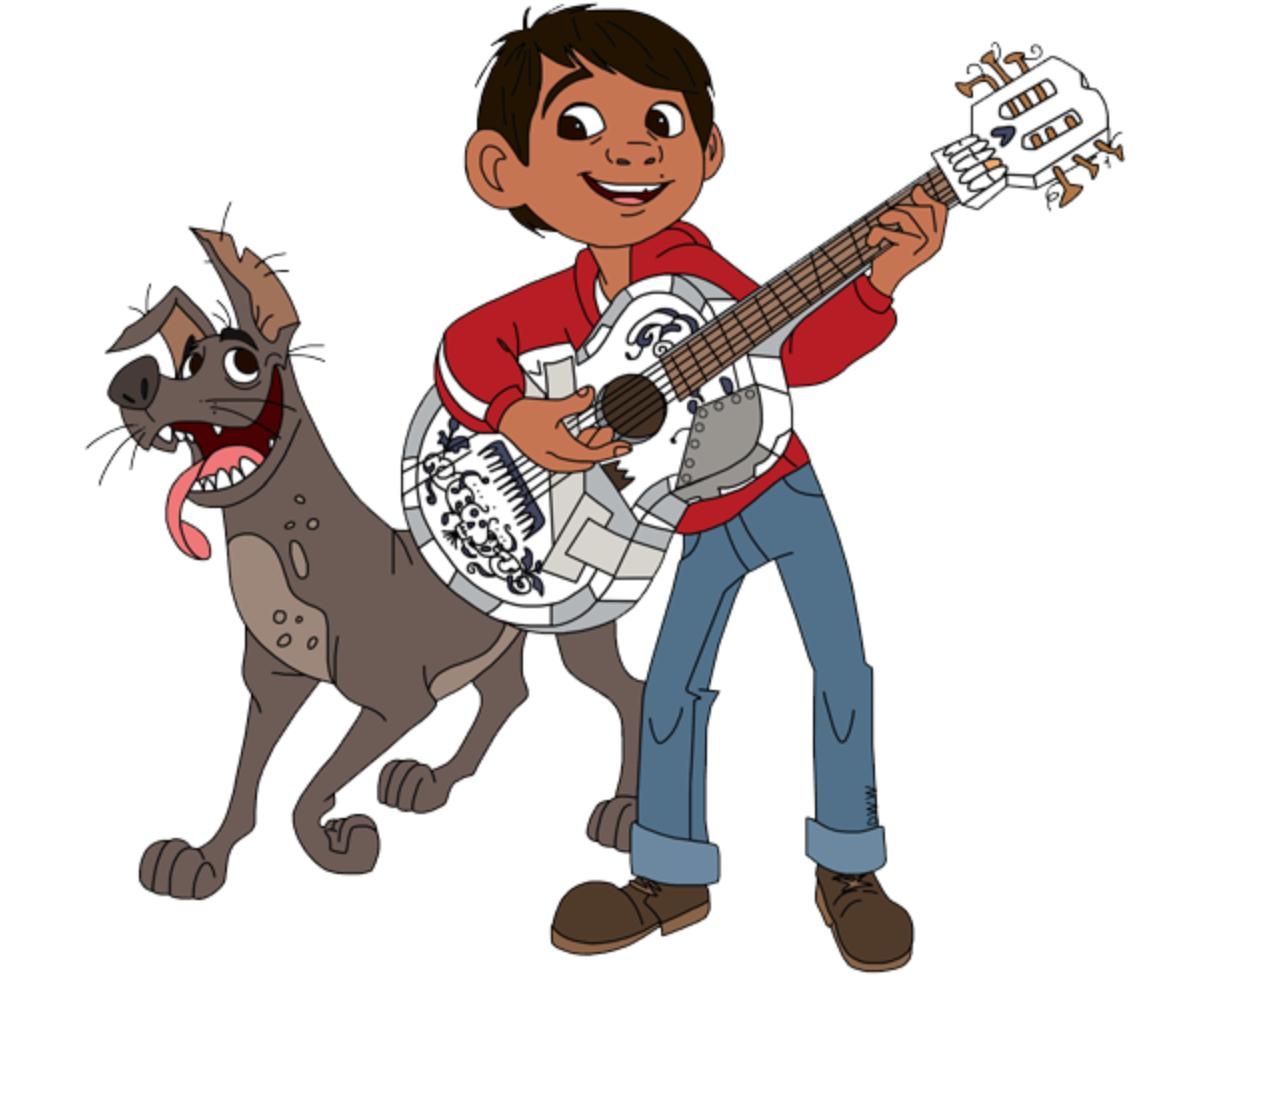 Miguel Rivera With His Handmade Guitar And His Dog Dante From Coco Dibujos Animados Personajes Coco Pelicula